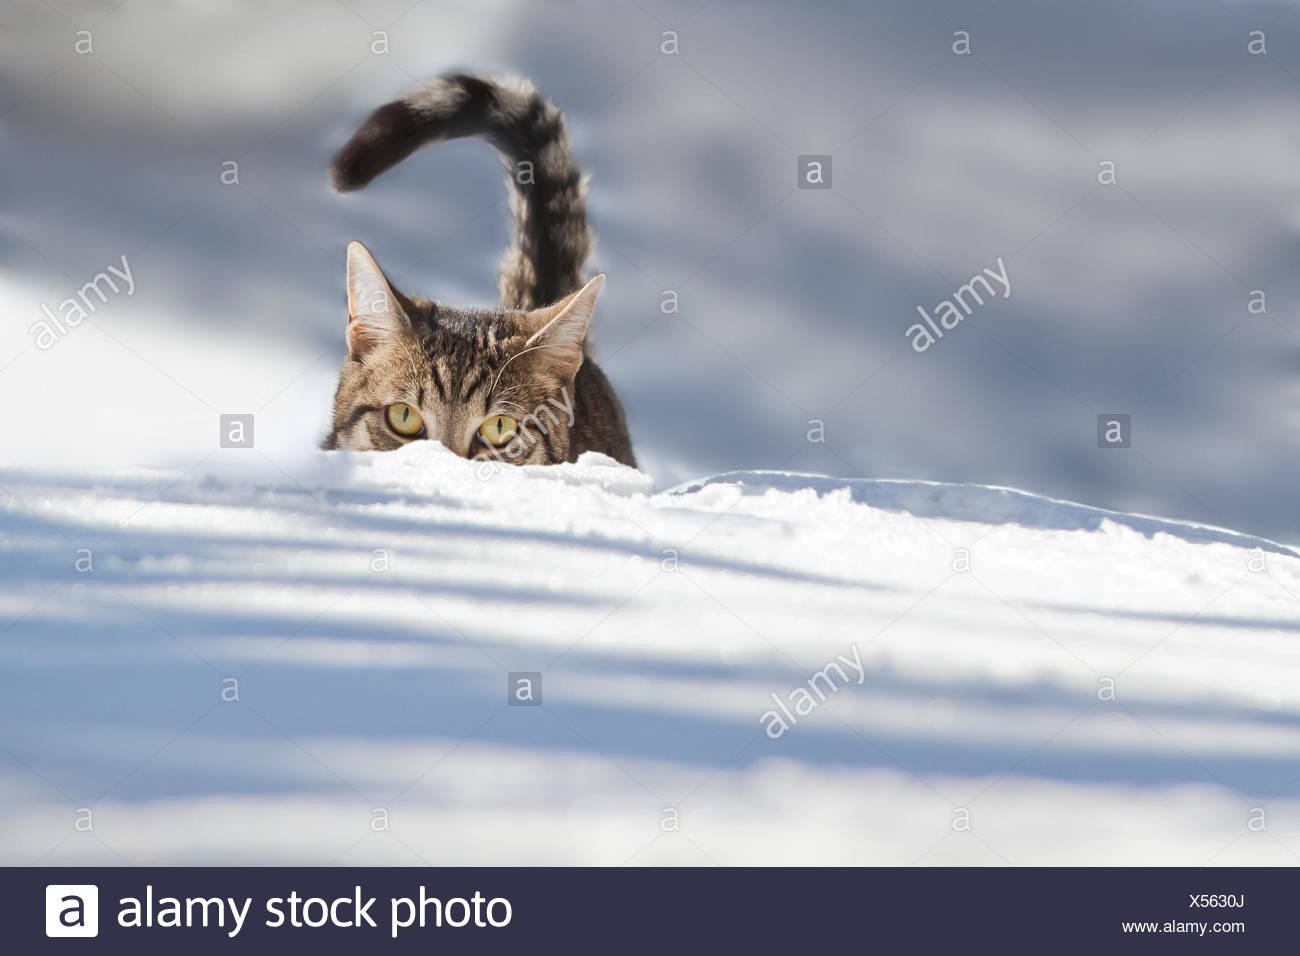 Cat walking through fresh snow, Bavaria, Germany Stock Photo